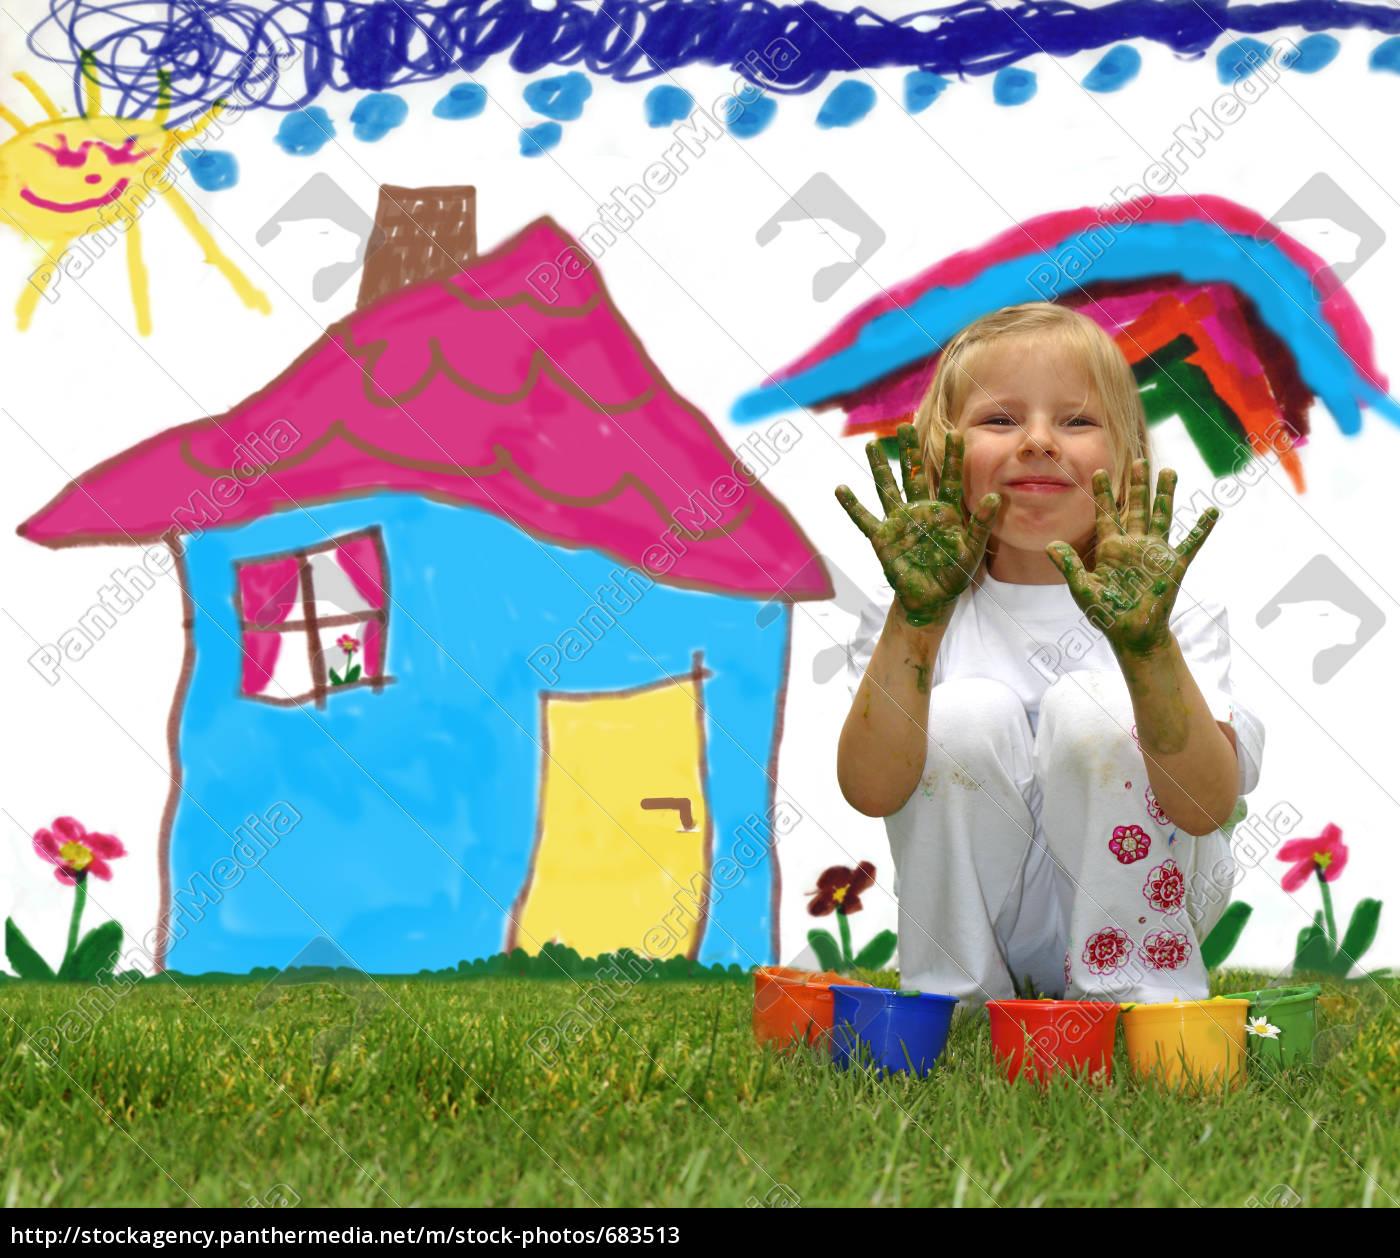 little, girl, paints, a, house - 683513